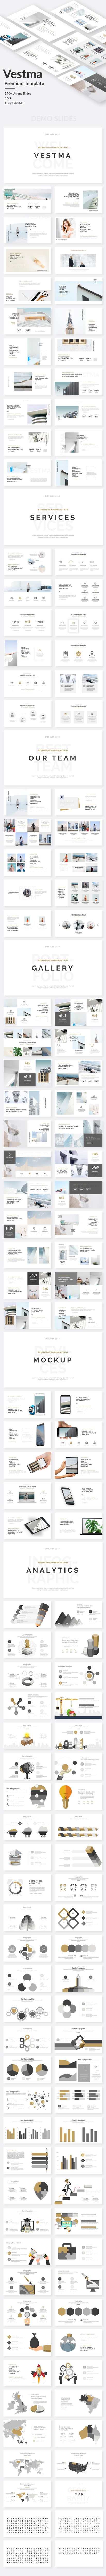 Vestma Creative Premium Powerpoint Template - Creative PowerPoint Templates